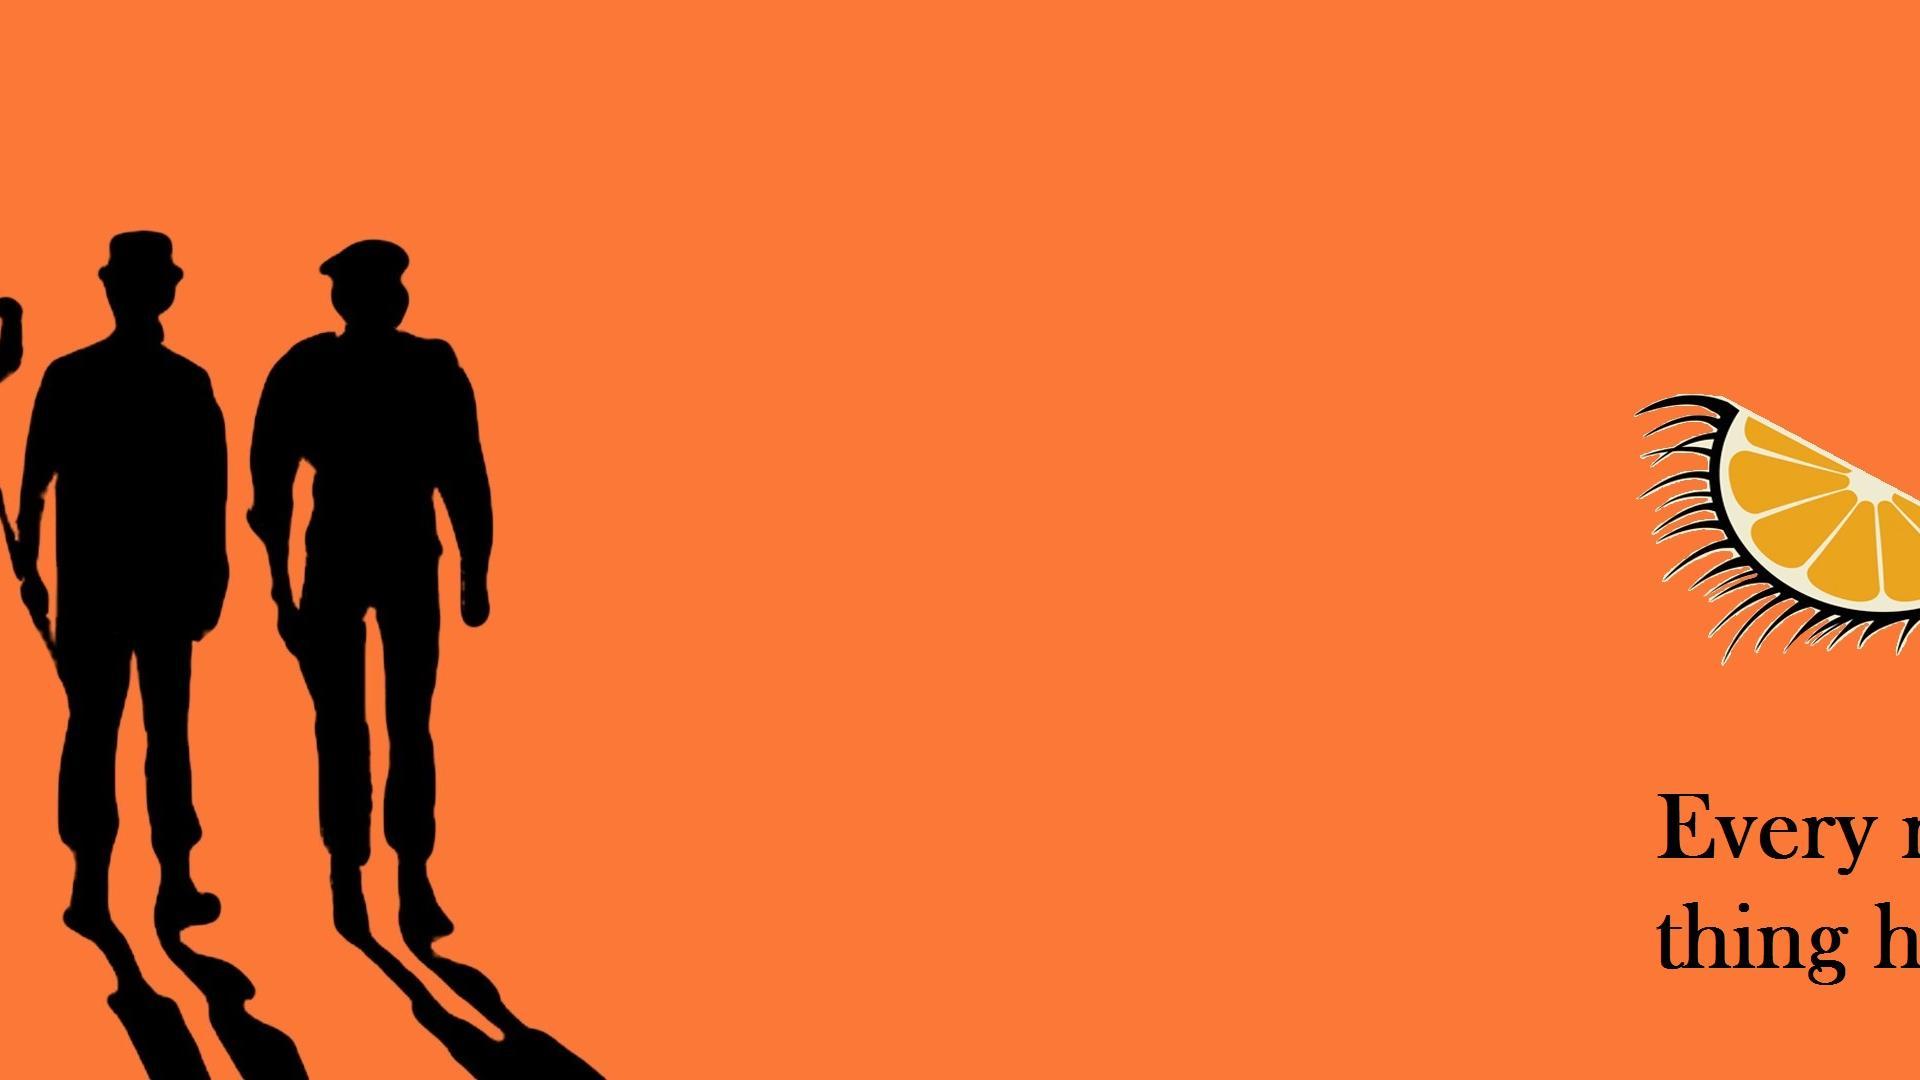 Free Download A Clockwork Orange Wallpaper 20 3800 X 1080